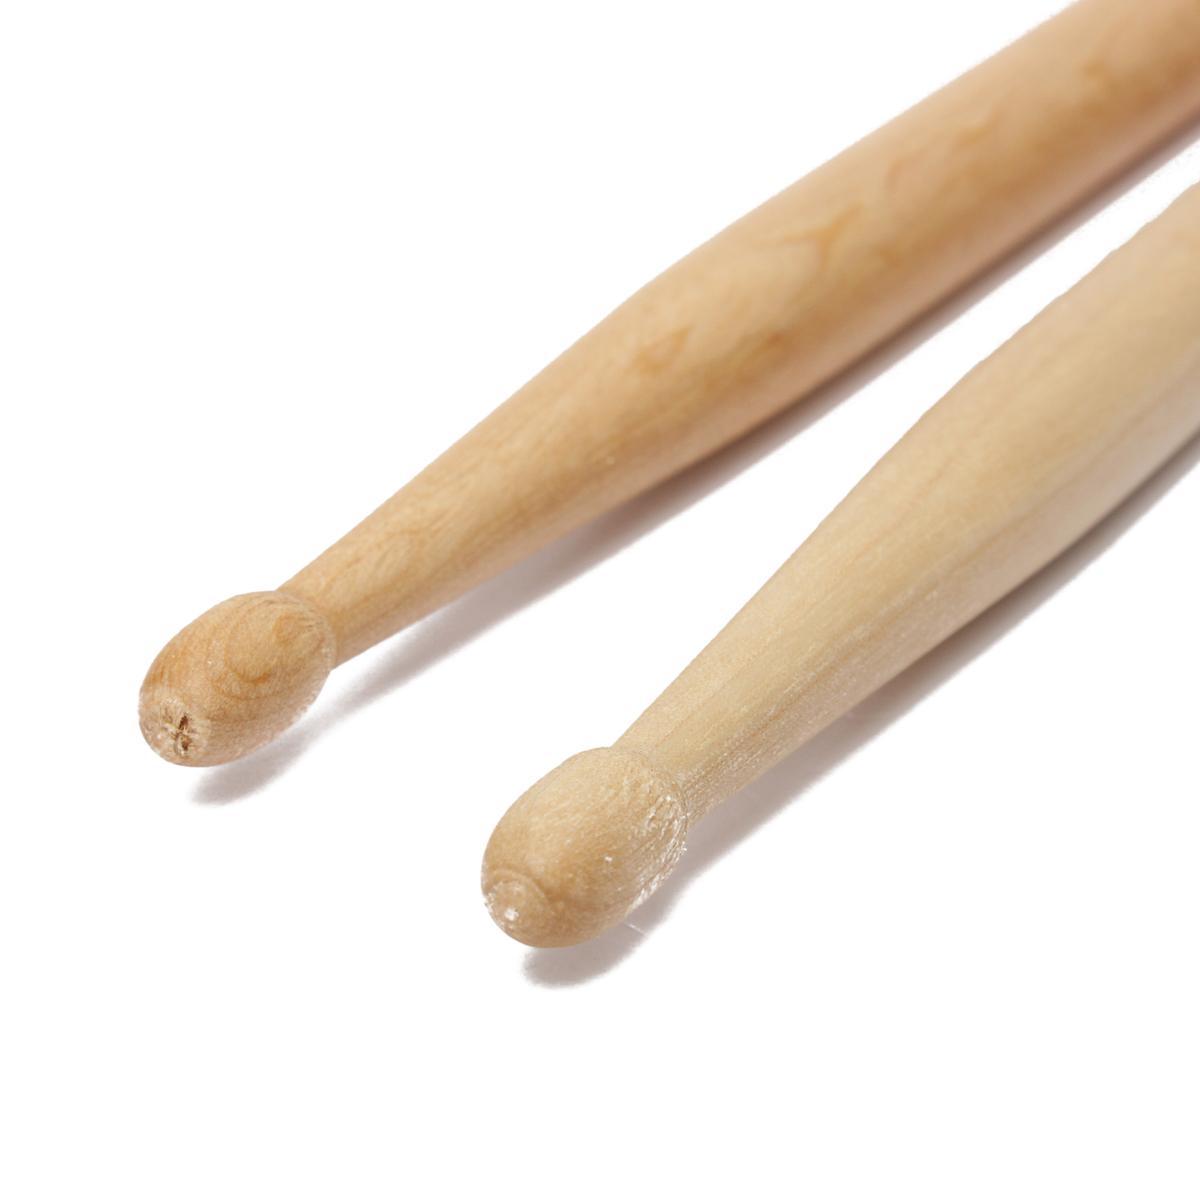 2 pcs one pair practical maple wood 7a drum sticks drumsticks music band accessories lazada. Black Bedroom Furniture Sets. Home Design Ideas